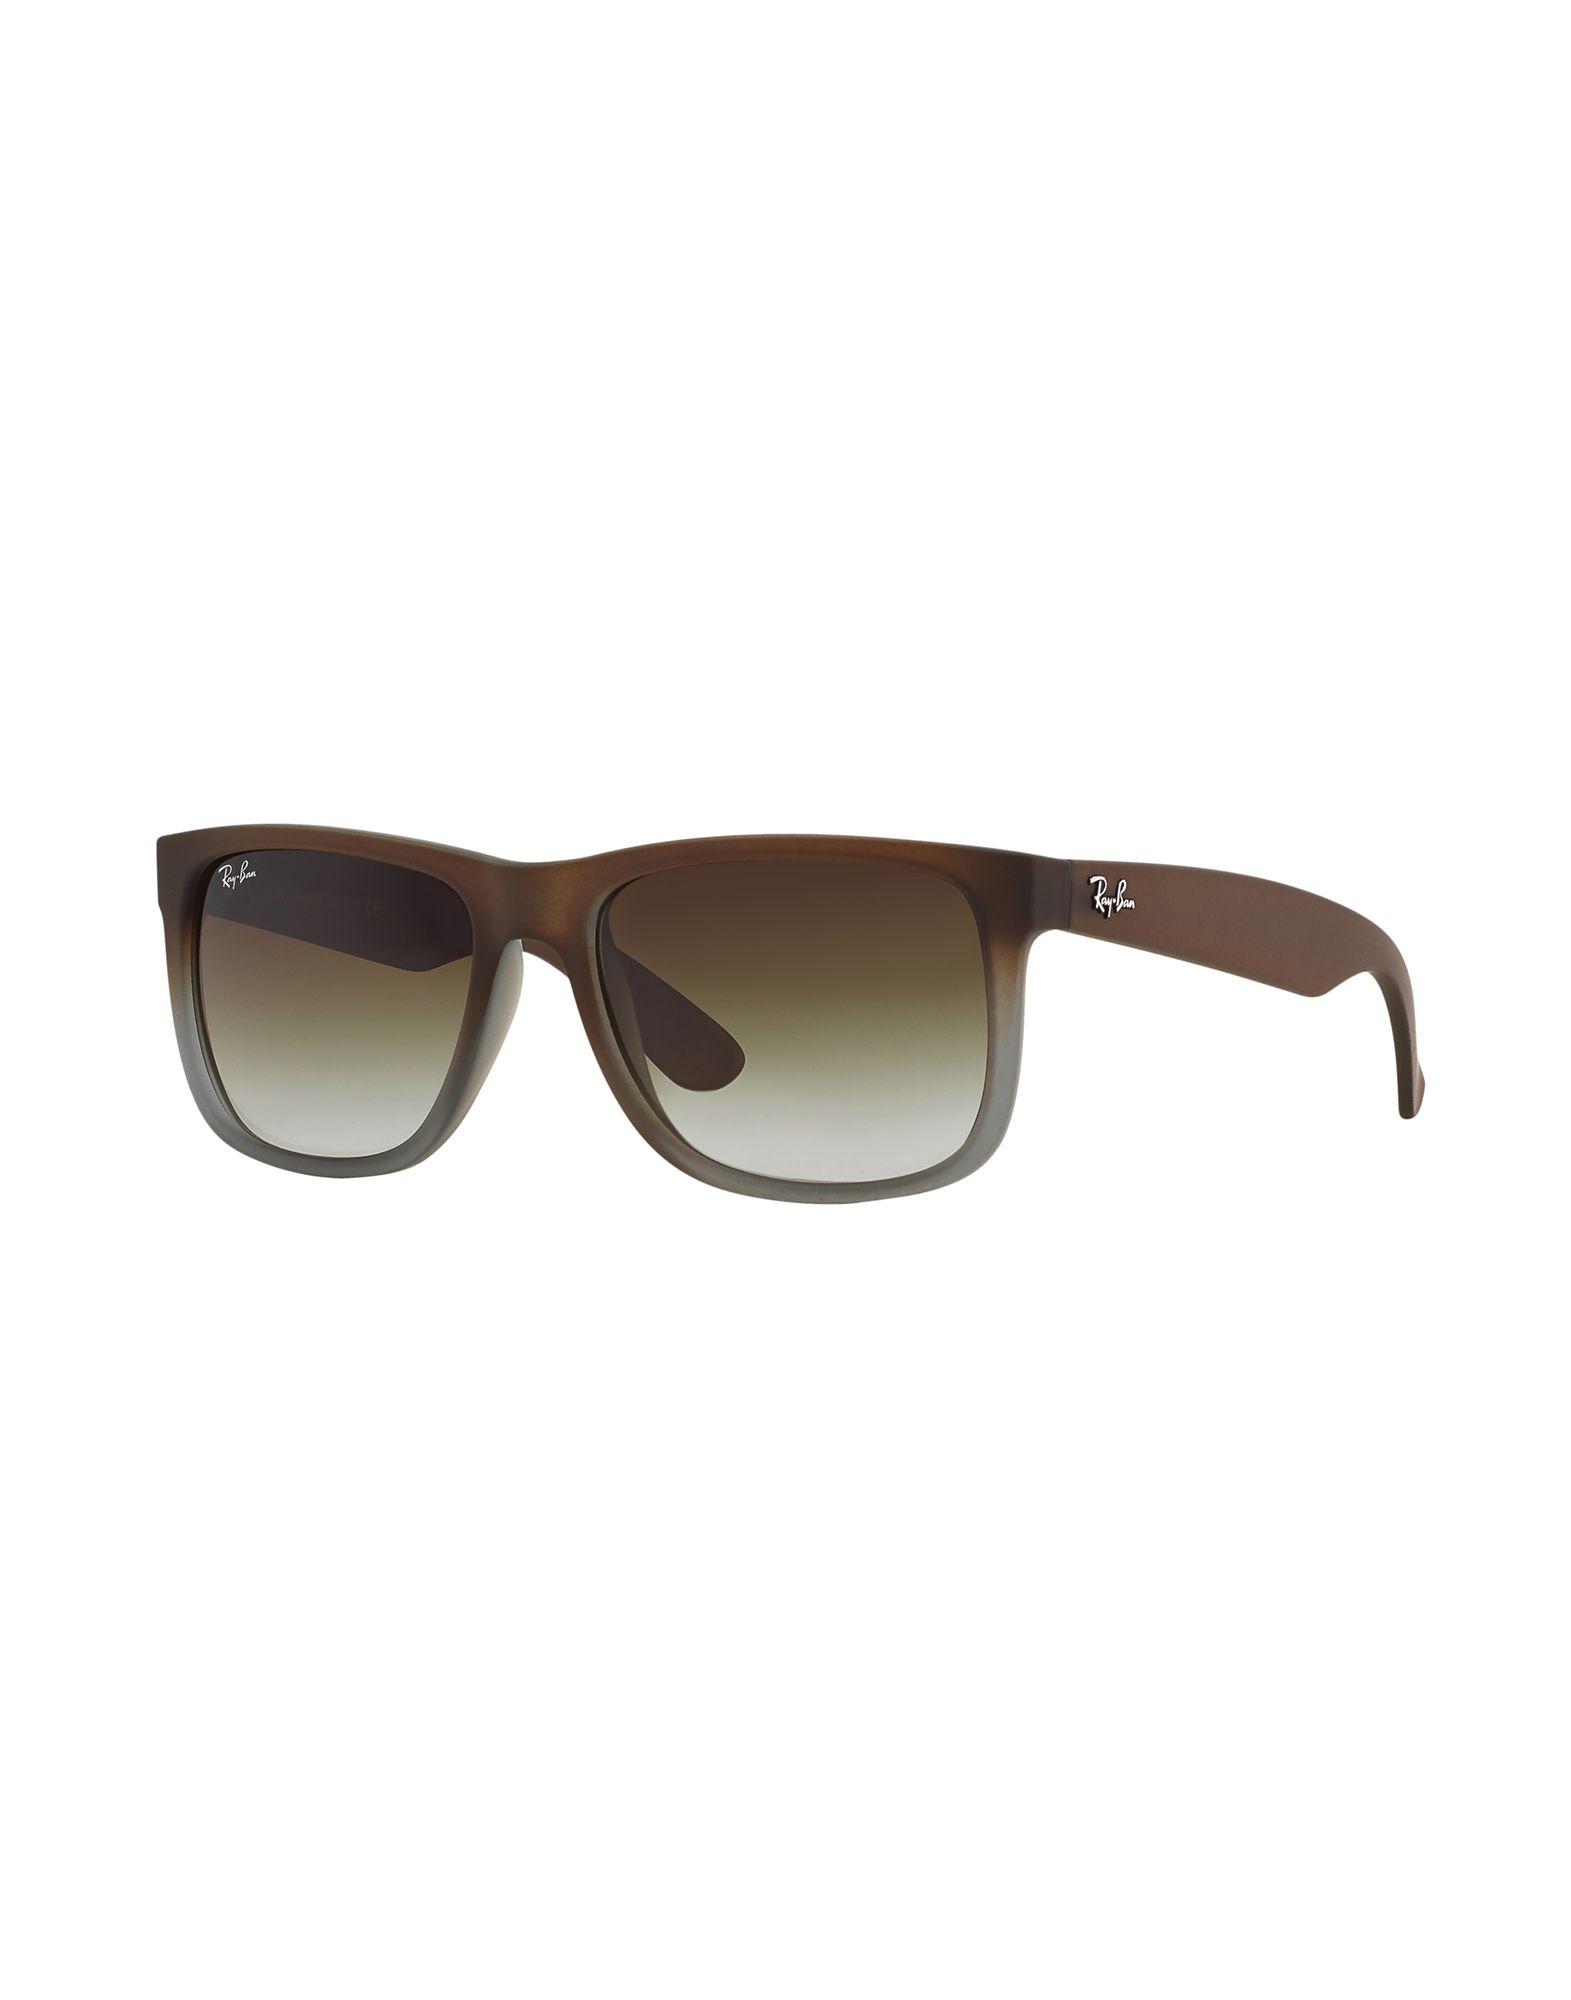 RAY-BAN Солнечные очки очки ray ban 0rb3549 006 7161